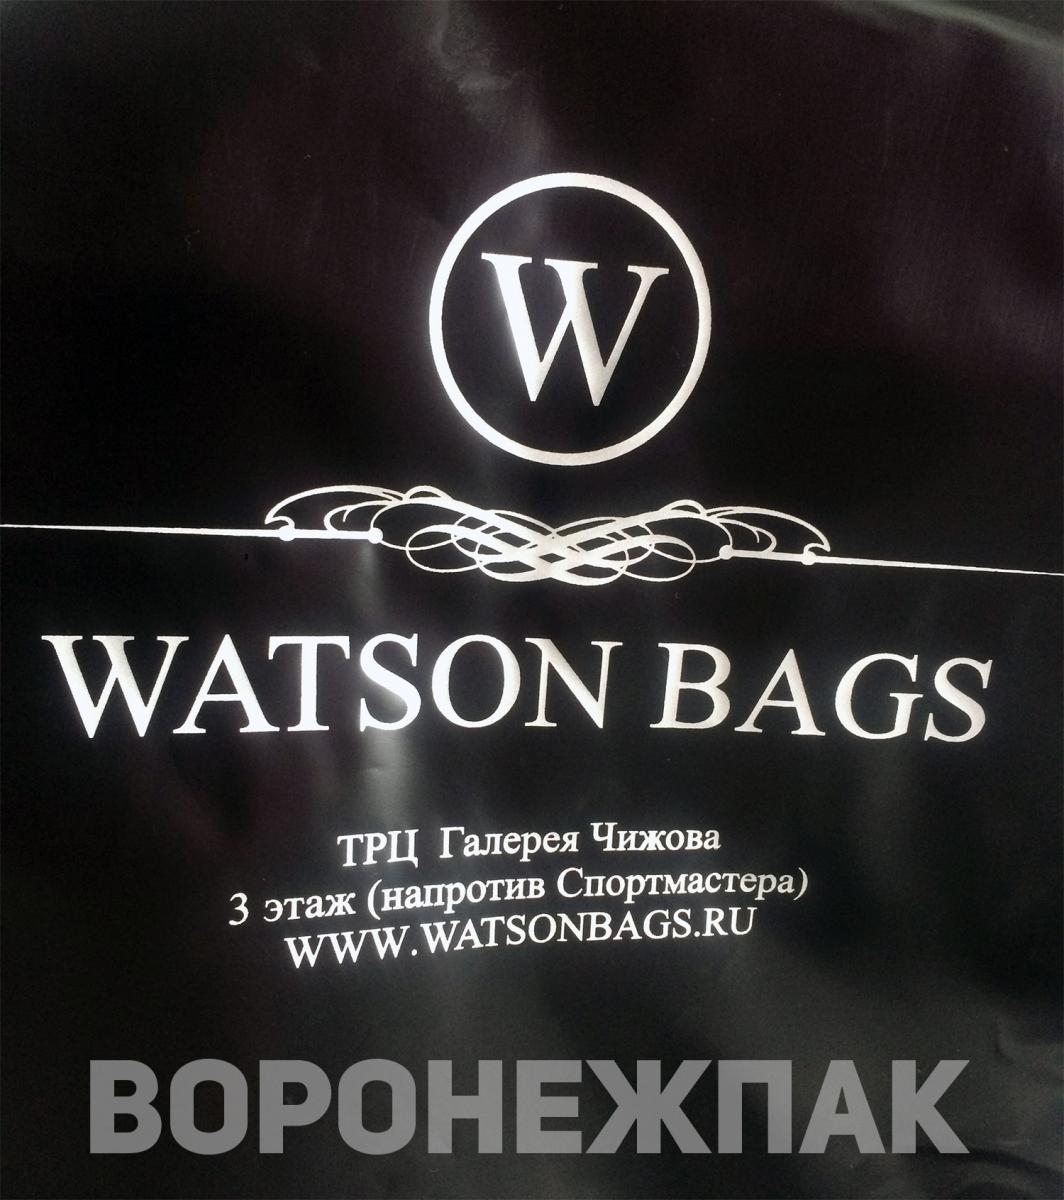 Стаканчики с логотипом, заказать стаканчики с логотипом